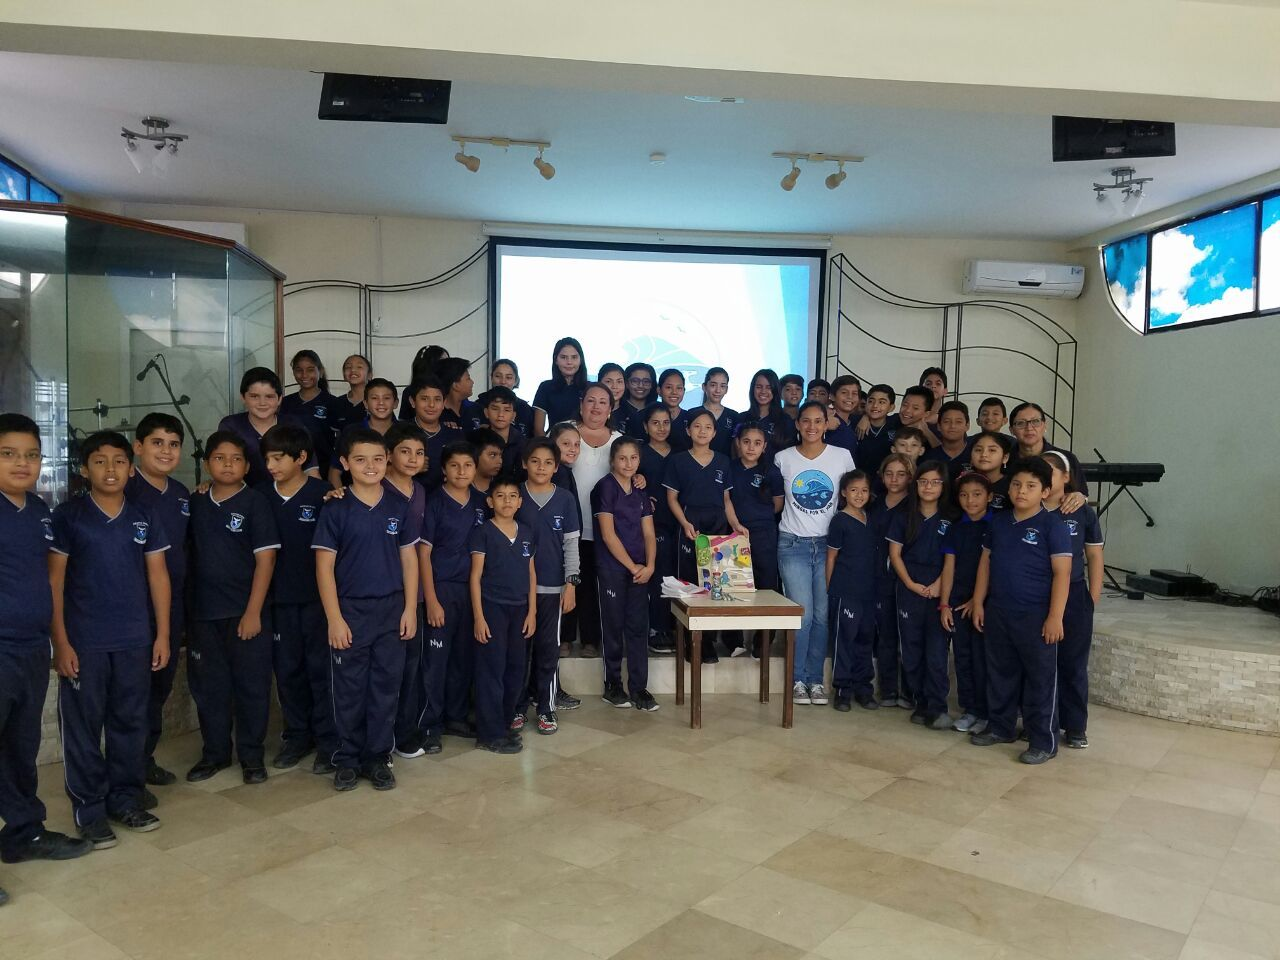 Charla - Unidad Educativa Nuevo Mundo